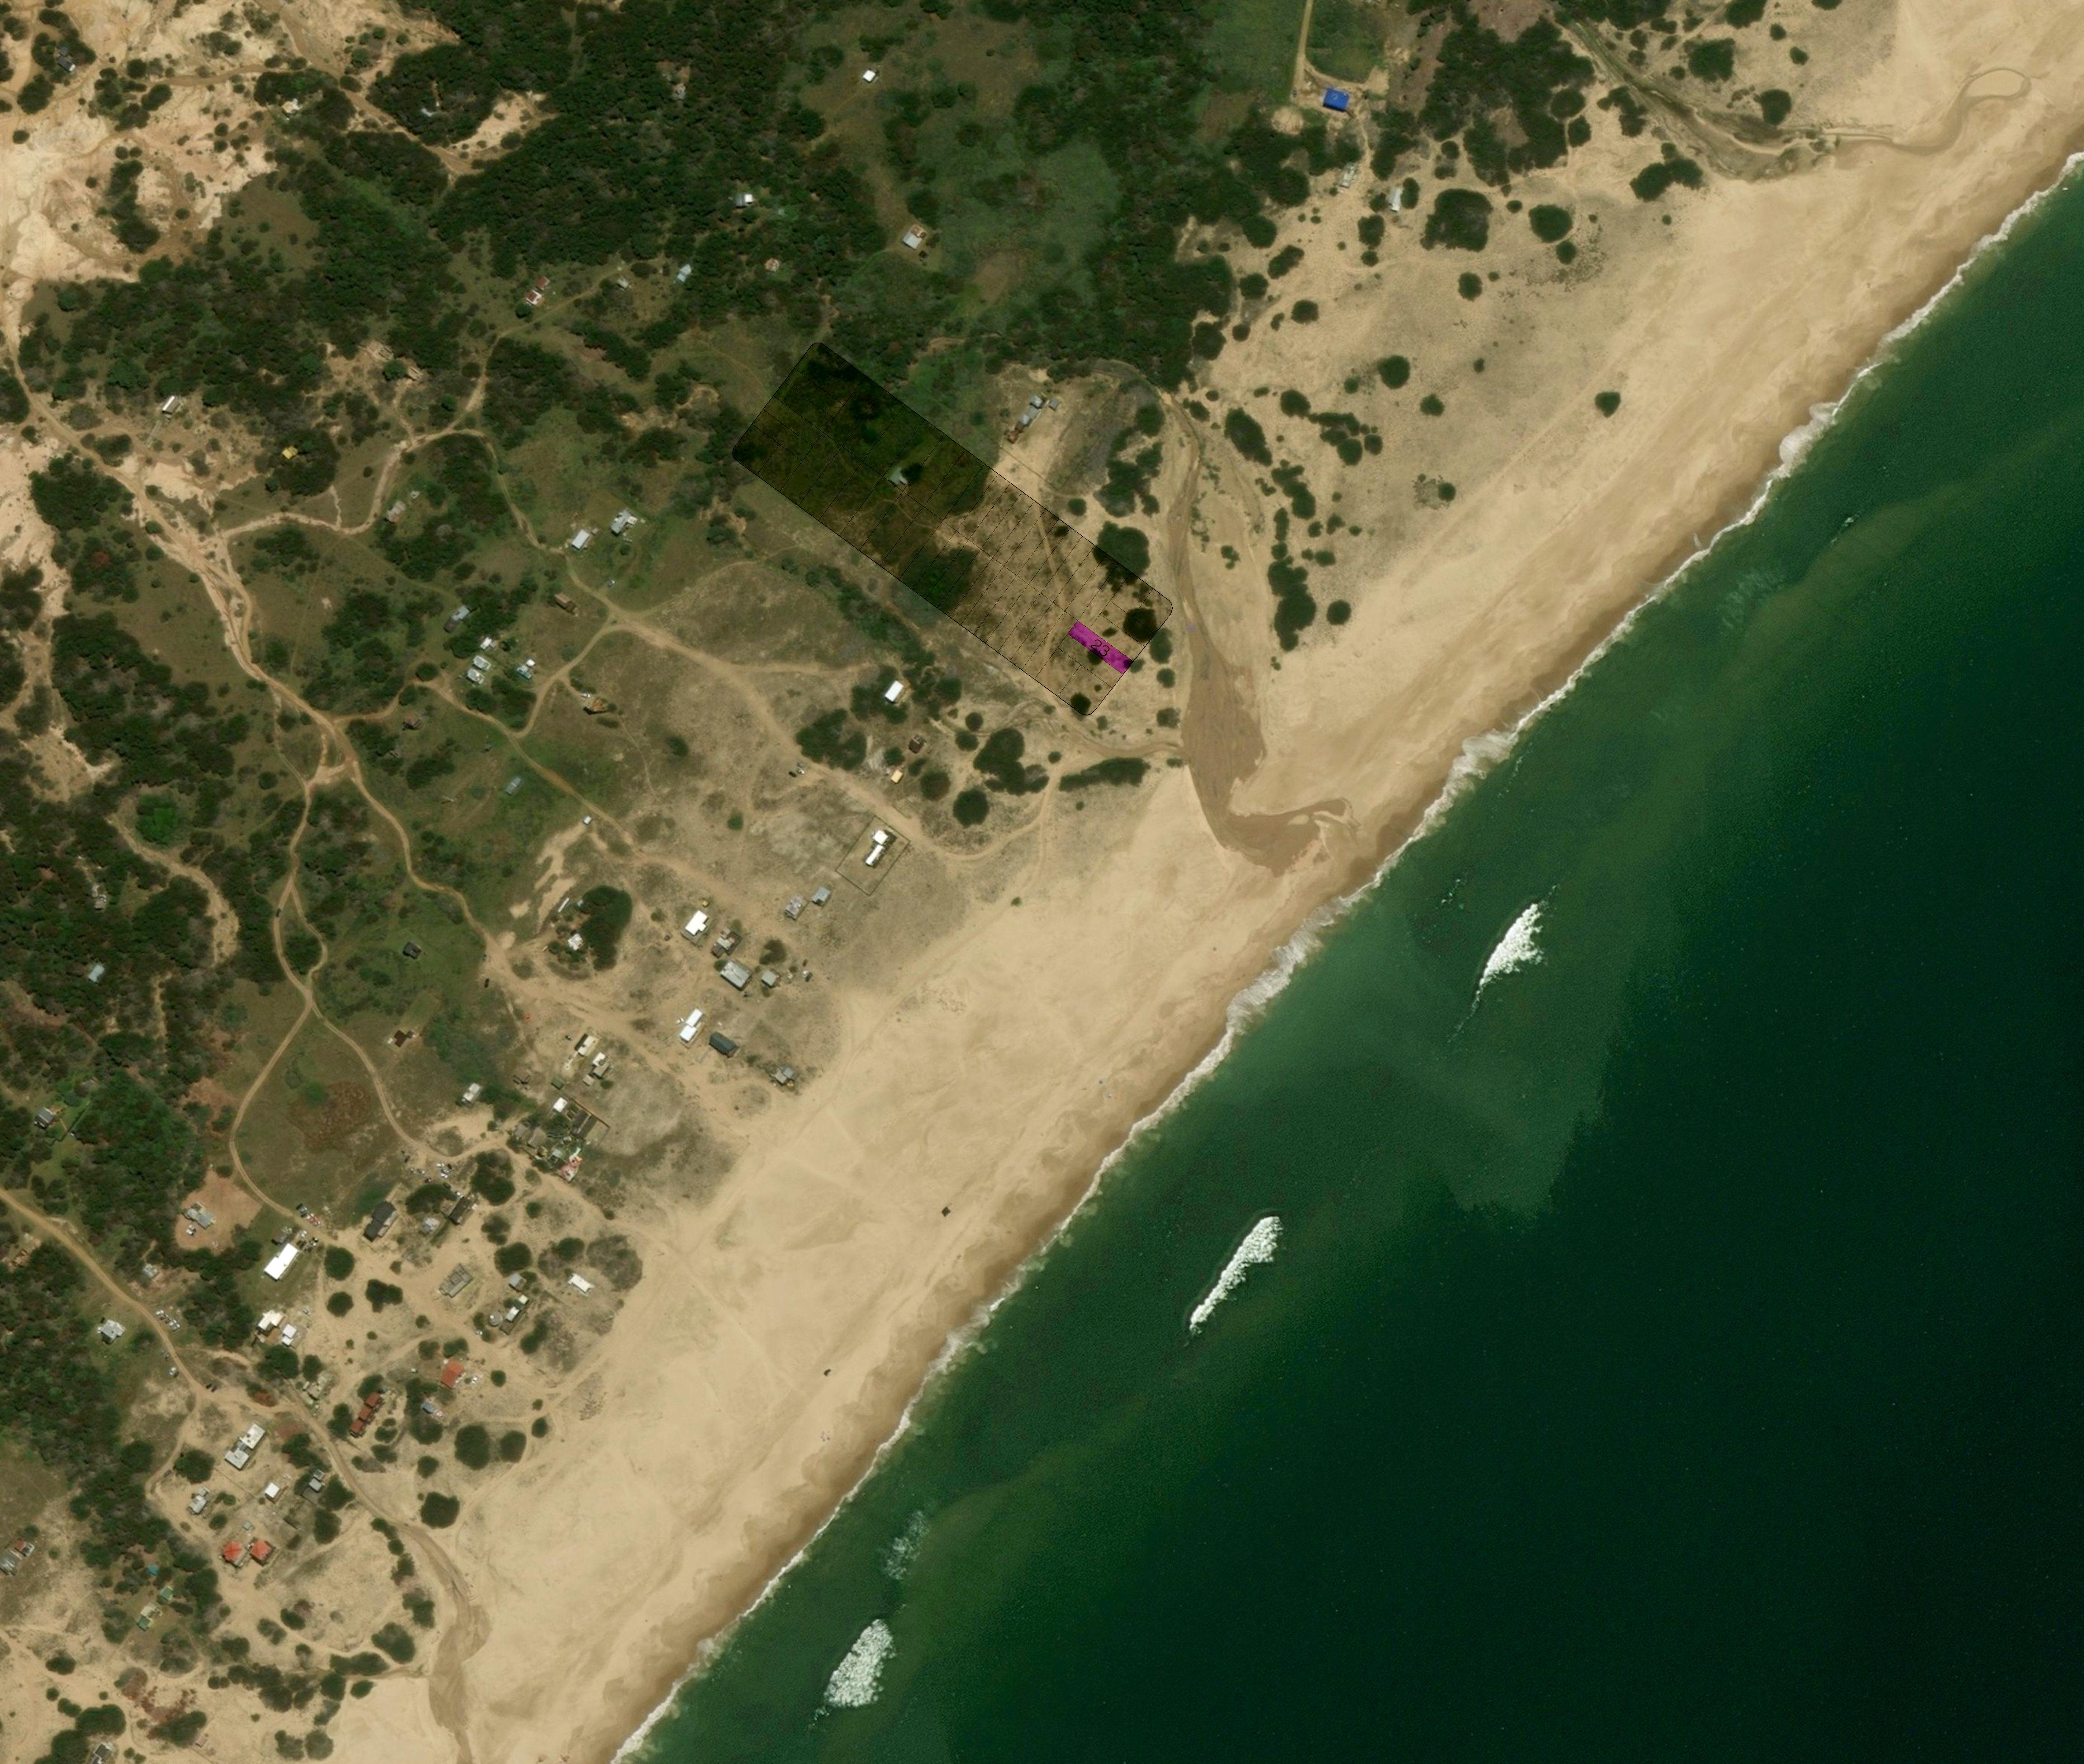 Punta Rubia, Manzana 17, Solar 23